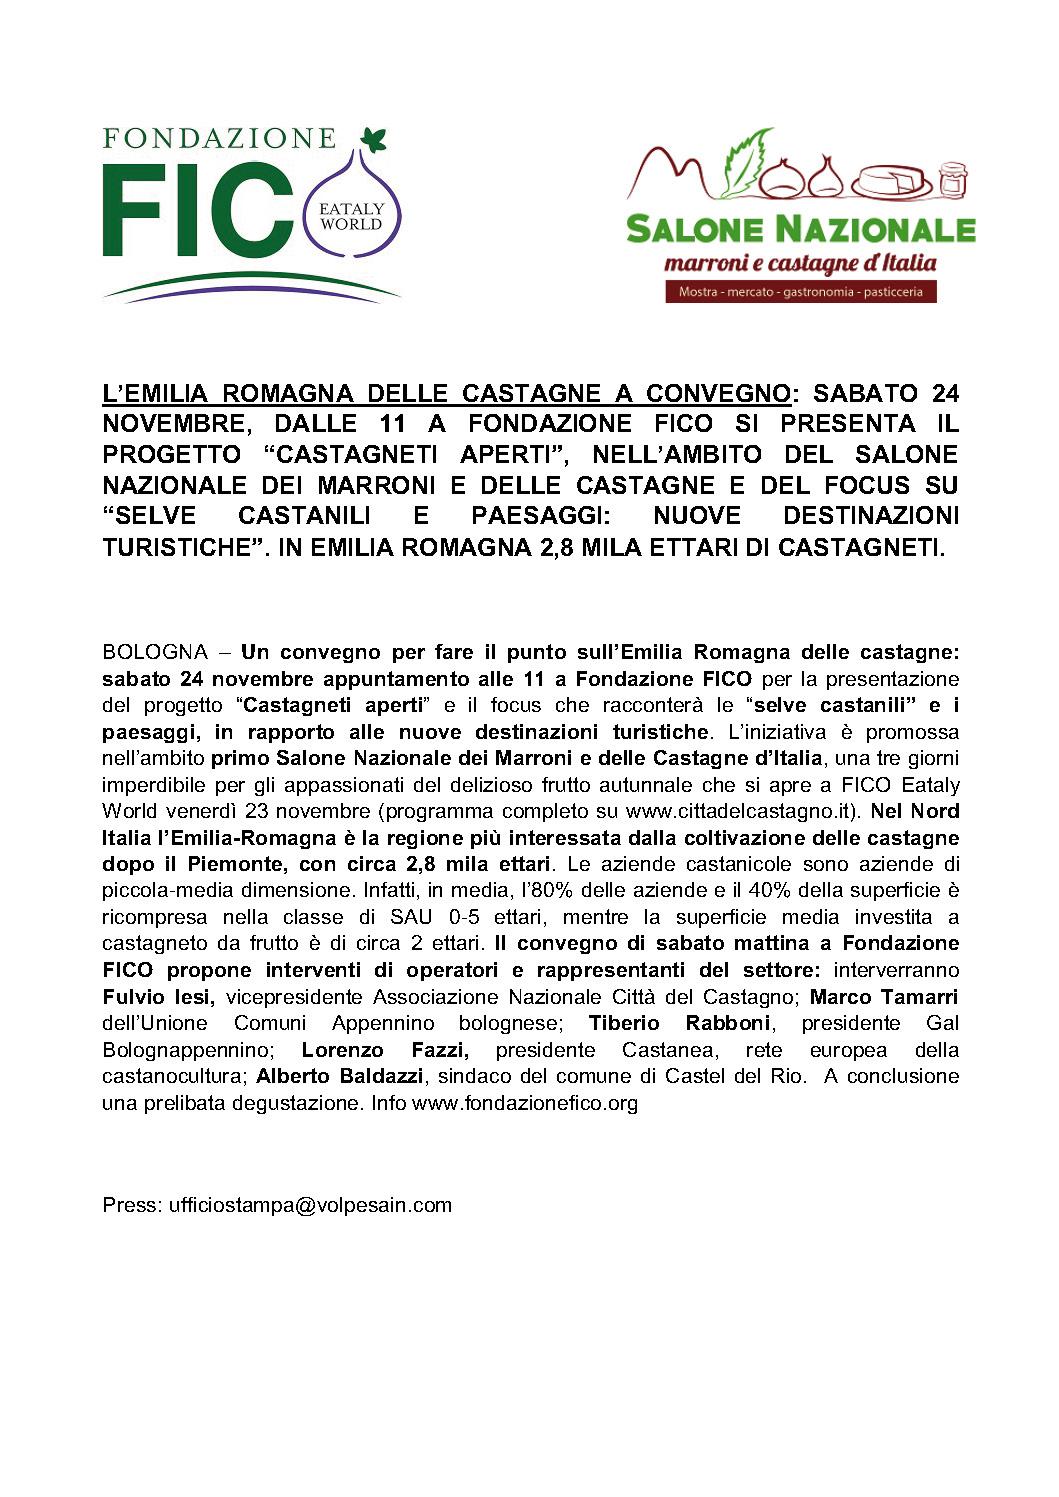 CS-0067-11-2018-CASTAGNE-MARRONI-CONVEGNO